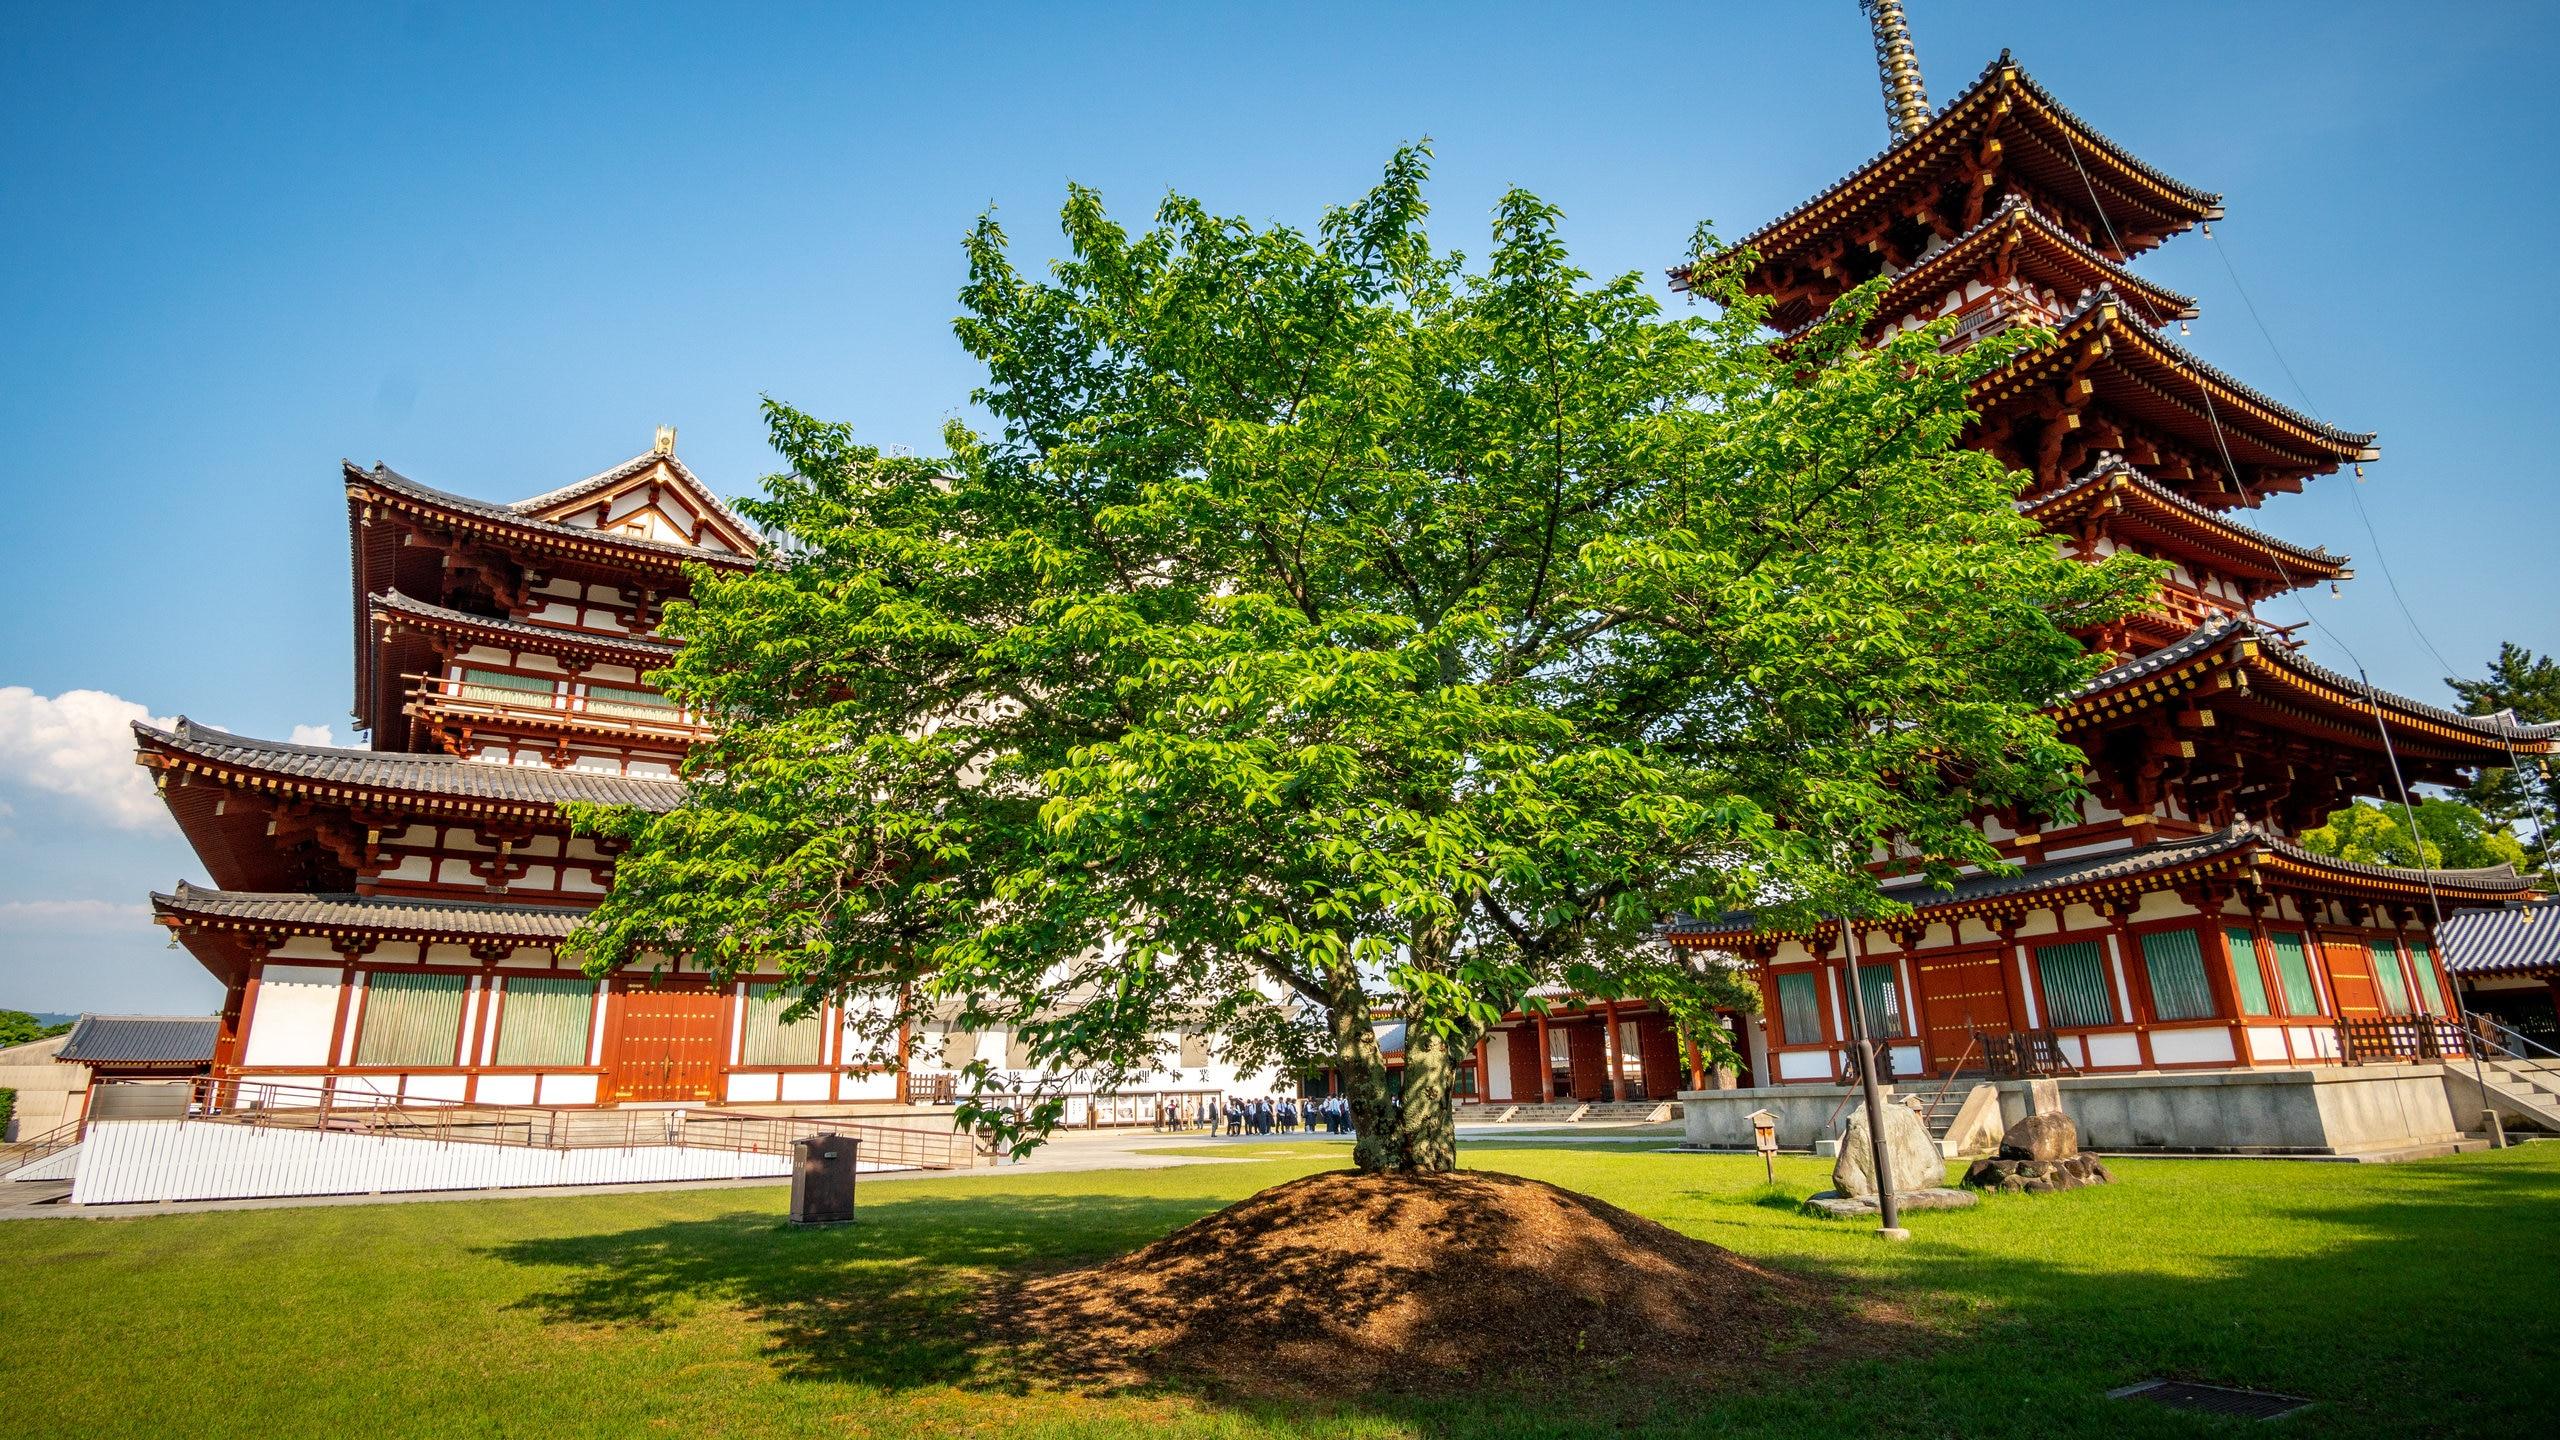 Yakushi-ji Temple, Nara, Nara Prefecture, Japan